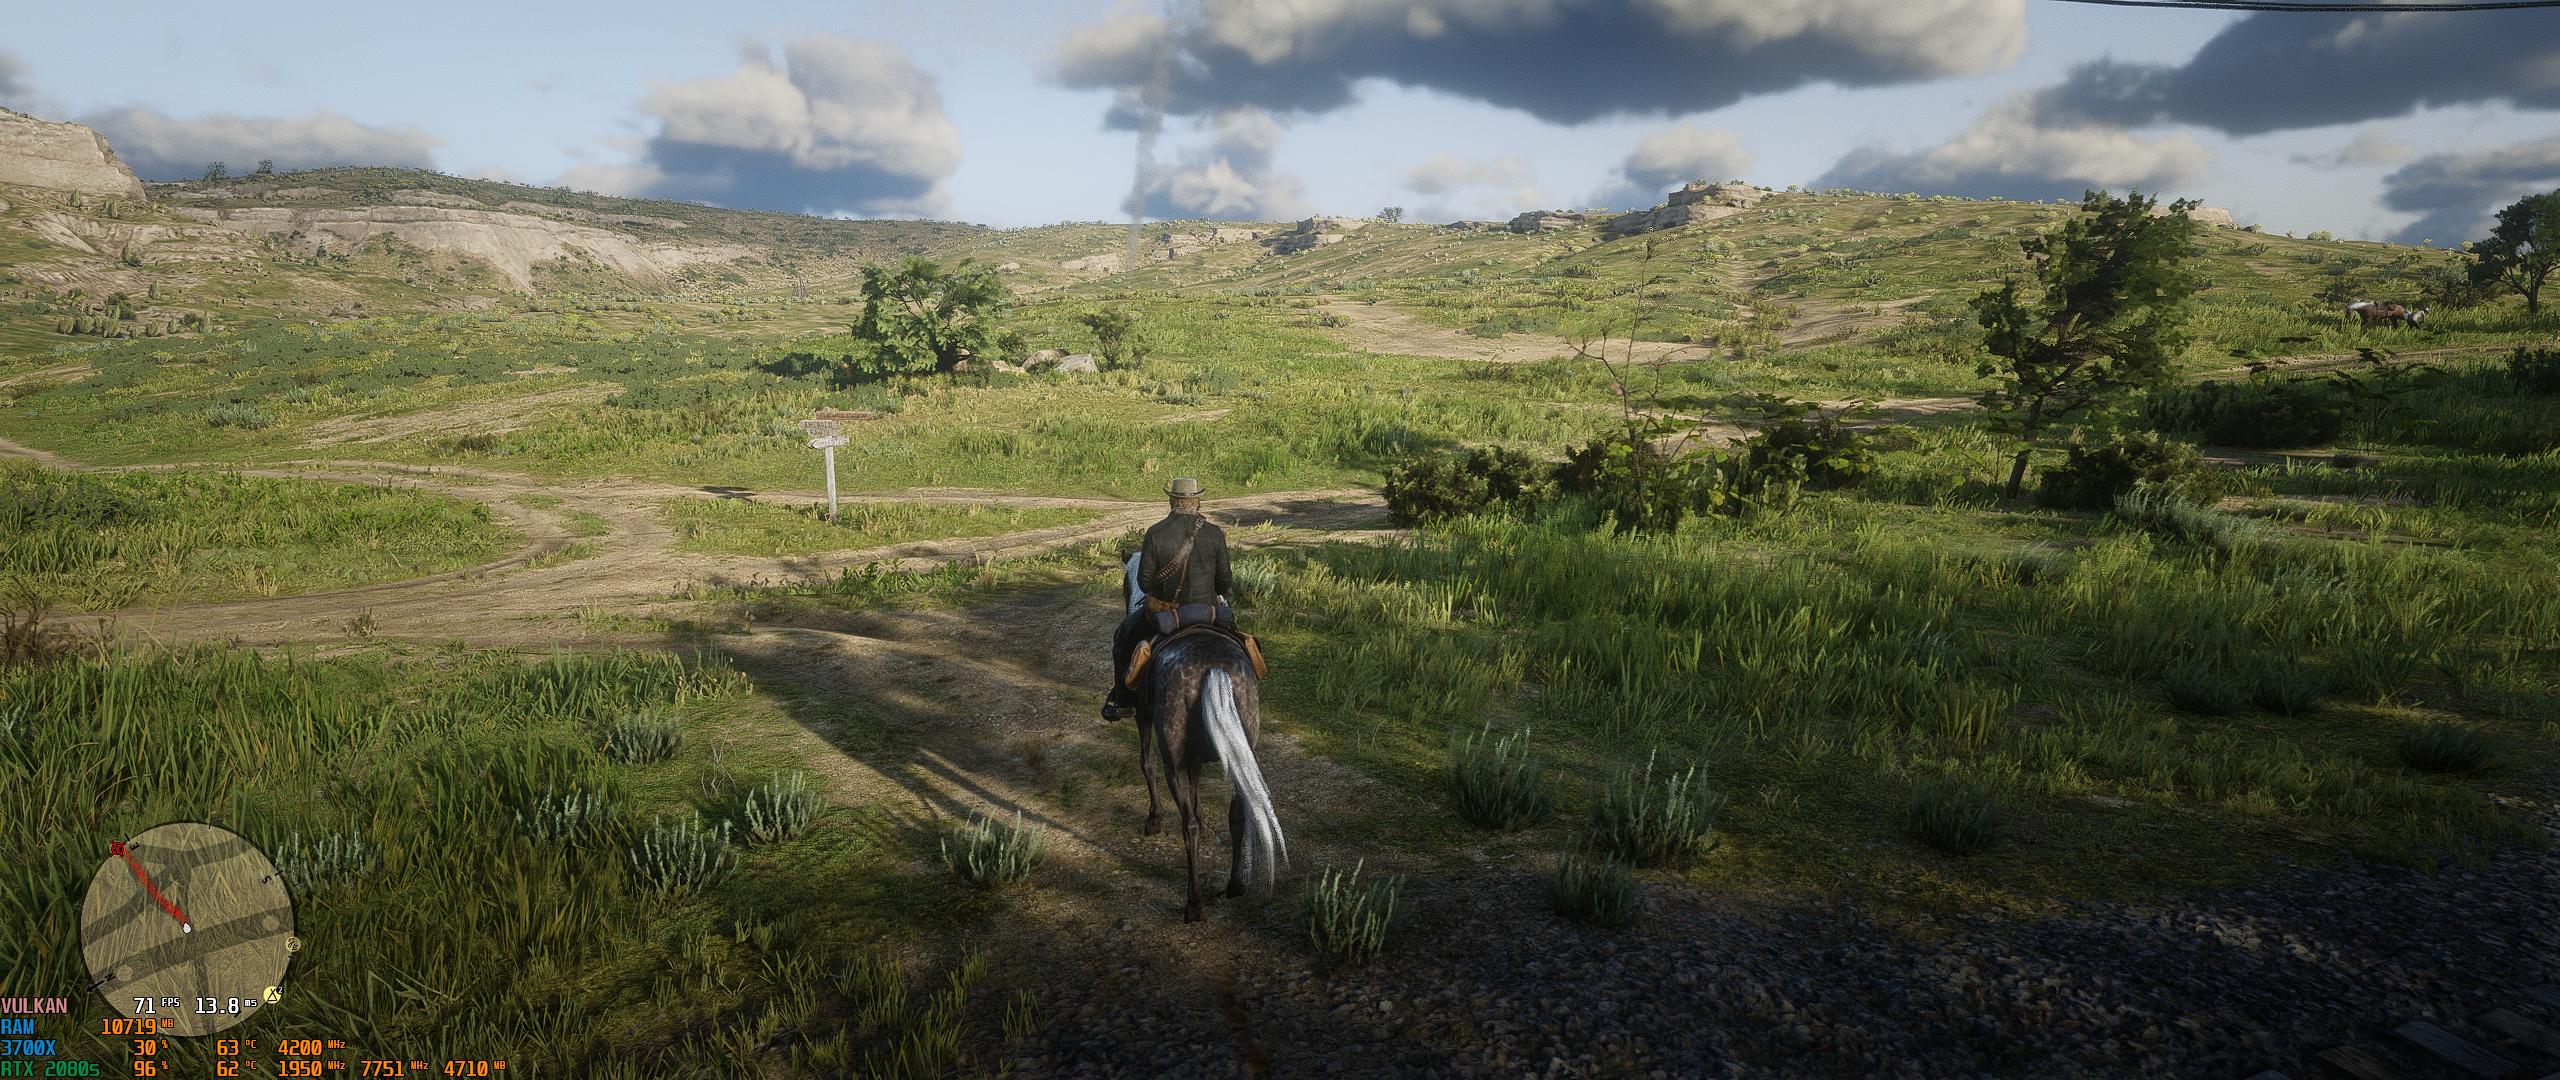 Red Dead Redemption II Screenshot 2019.11.13 - 10.15.54.71.png - Red Dead Redemption 2